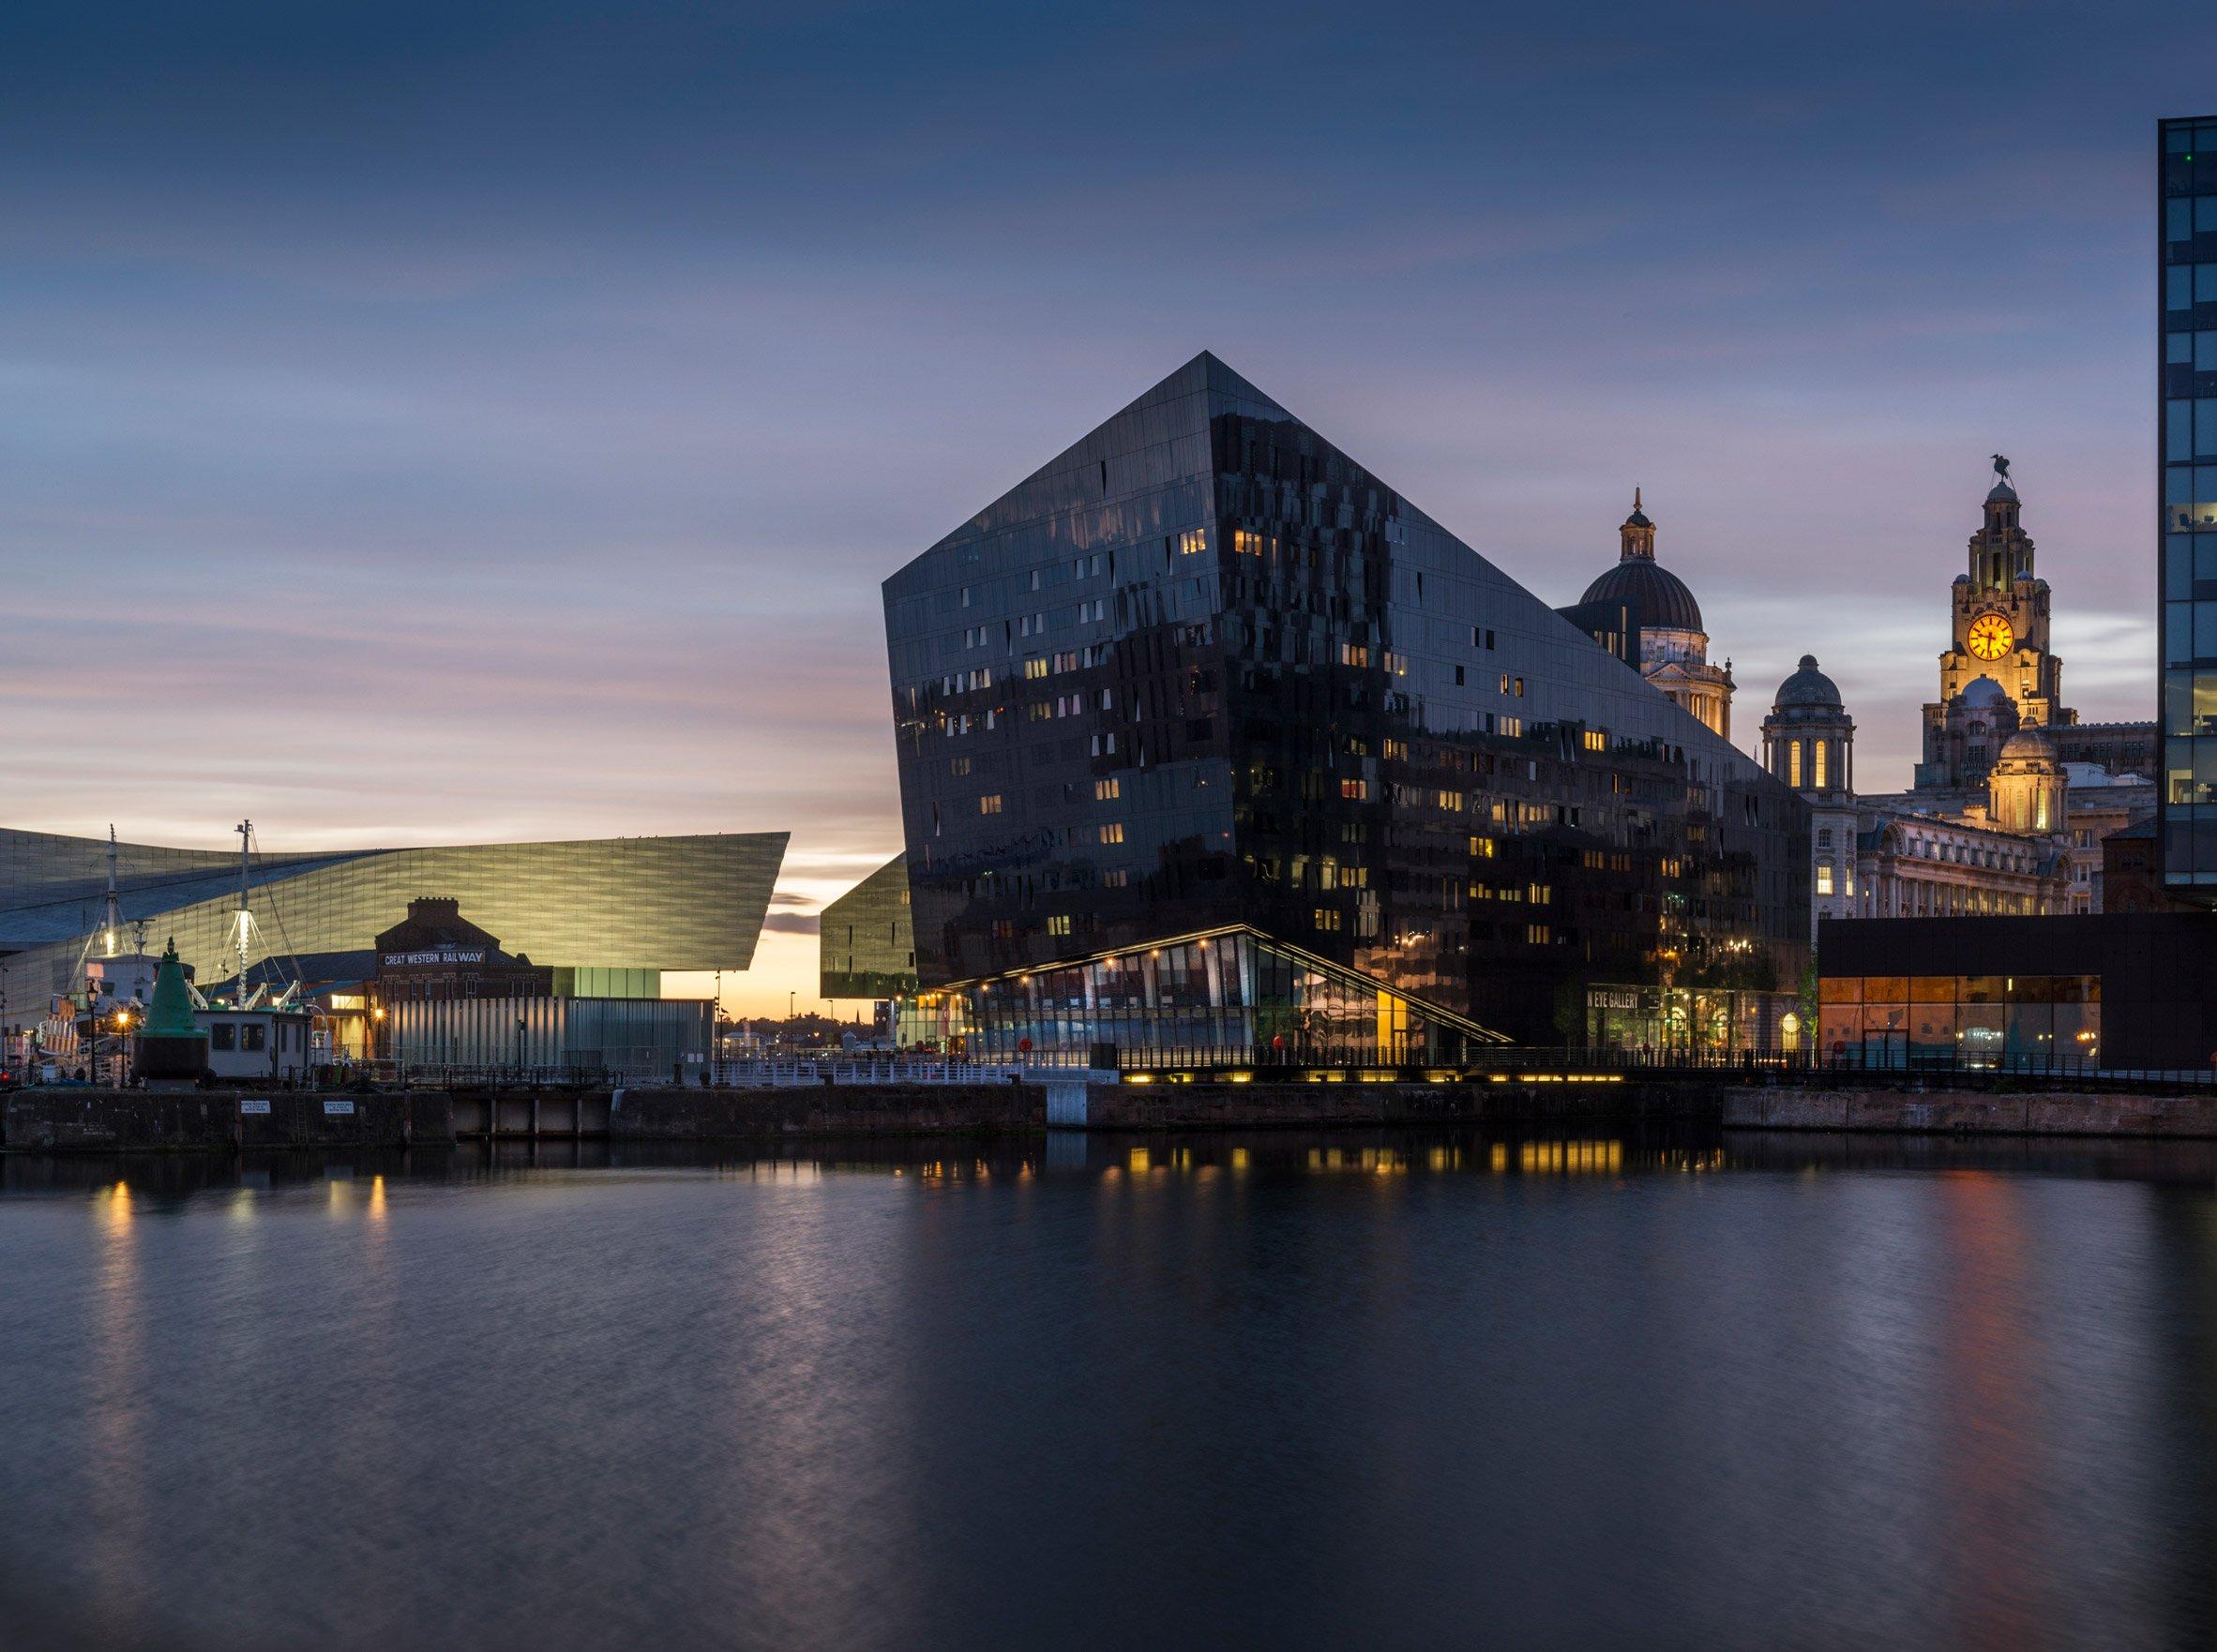 RIBA North architecture centre opens on Liverpool's Mann Island